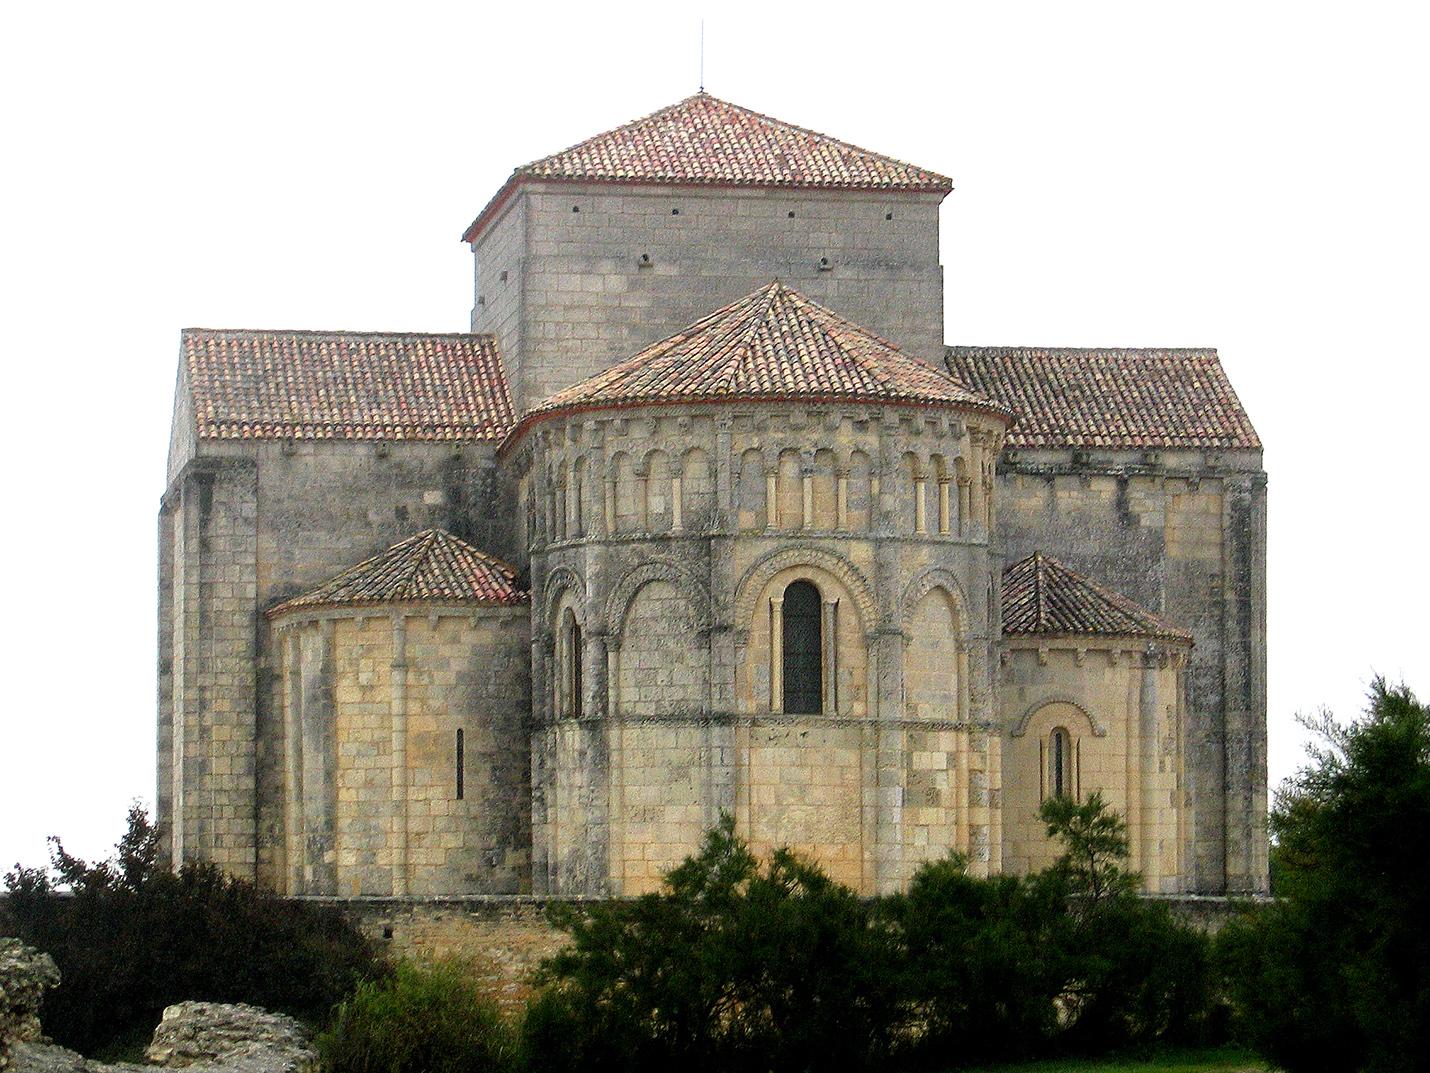 Talmond sur Gironde